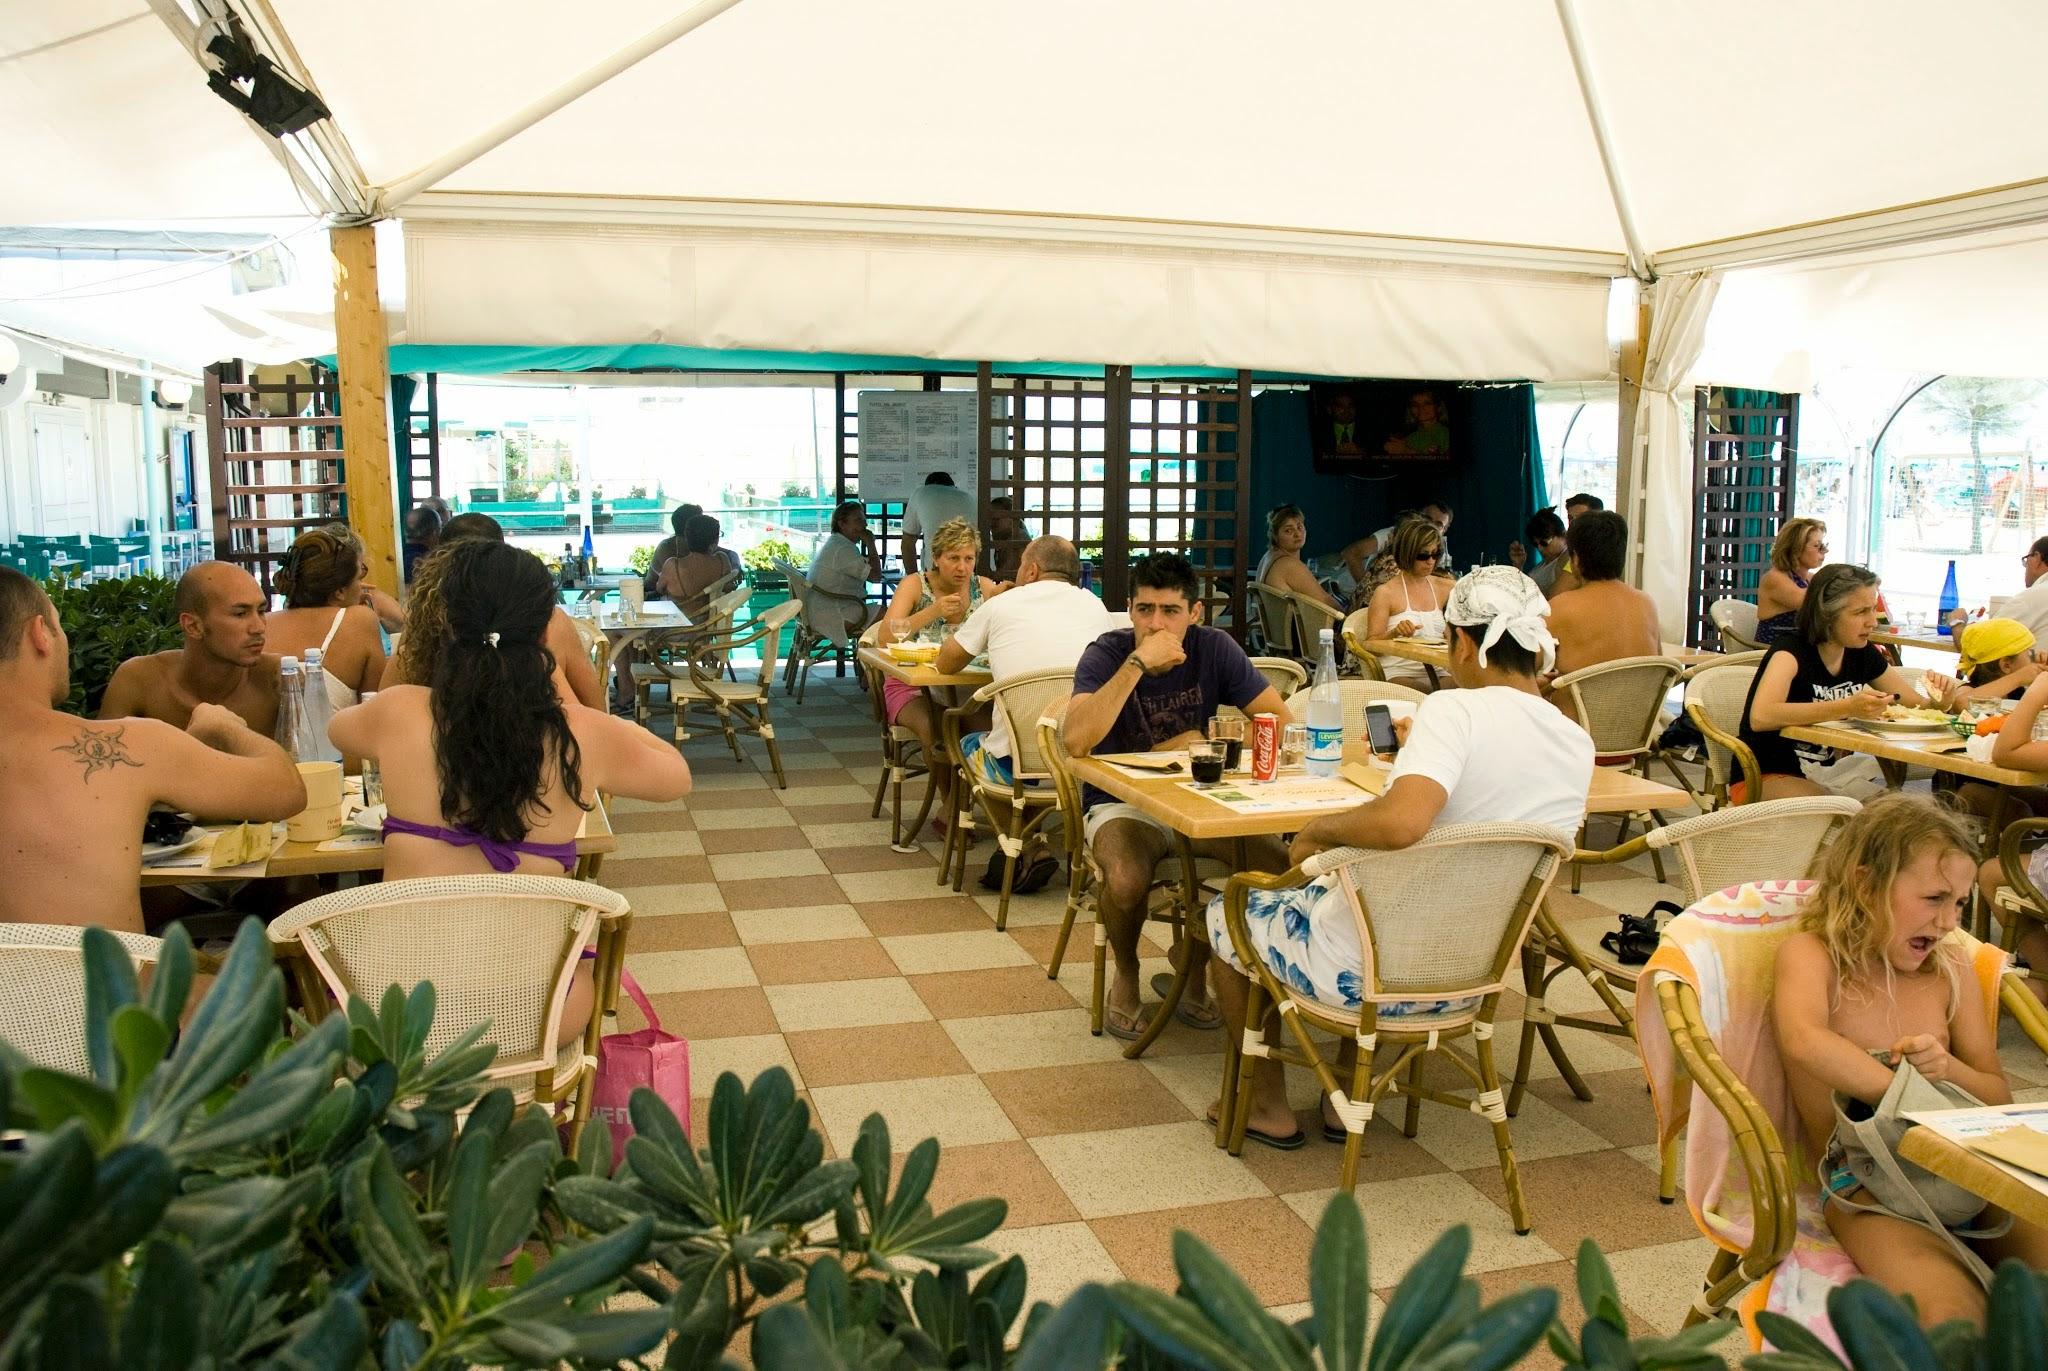 Bagno Lido Beach 219 | Ristorante | Bar - Cervia - Foto 1